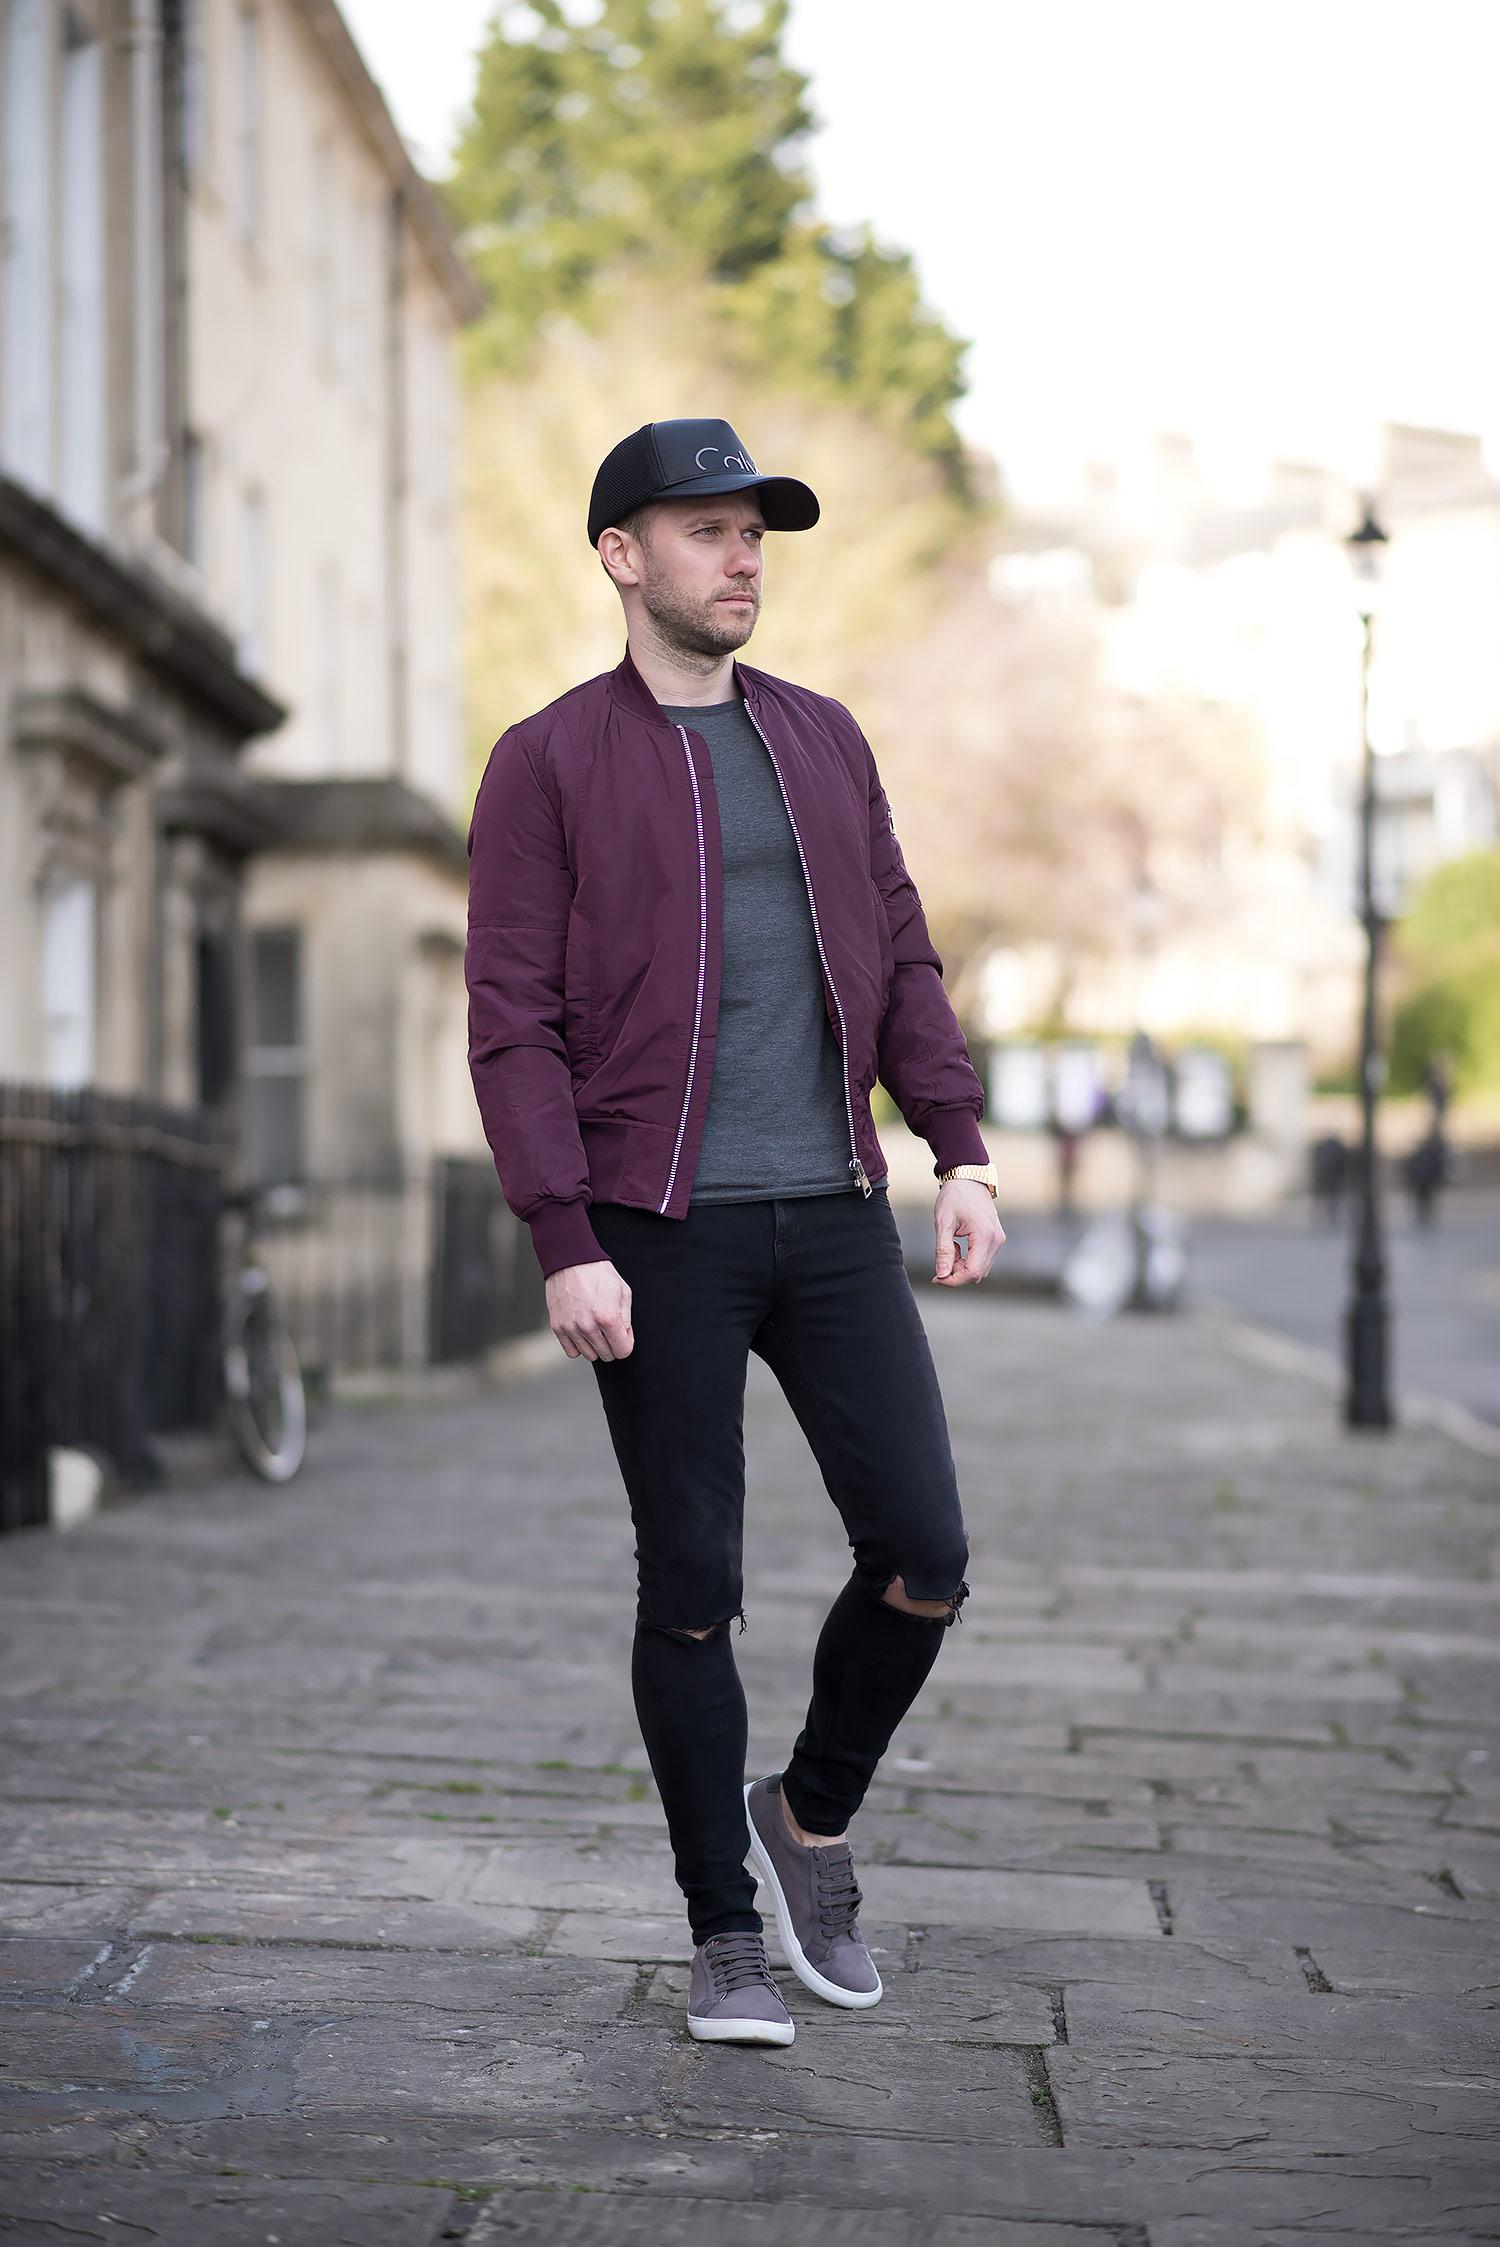 superb burgundy blazer